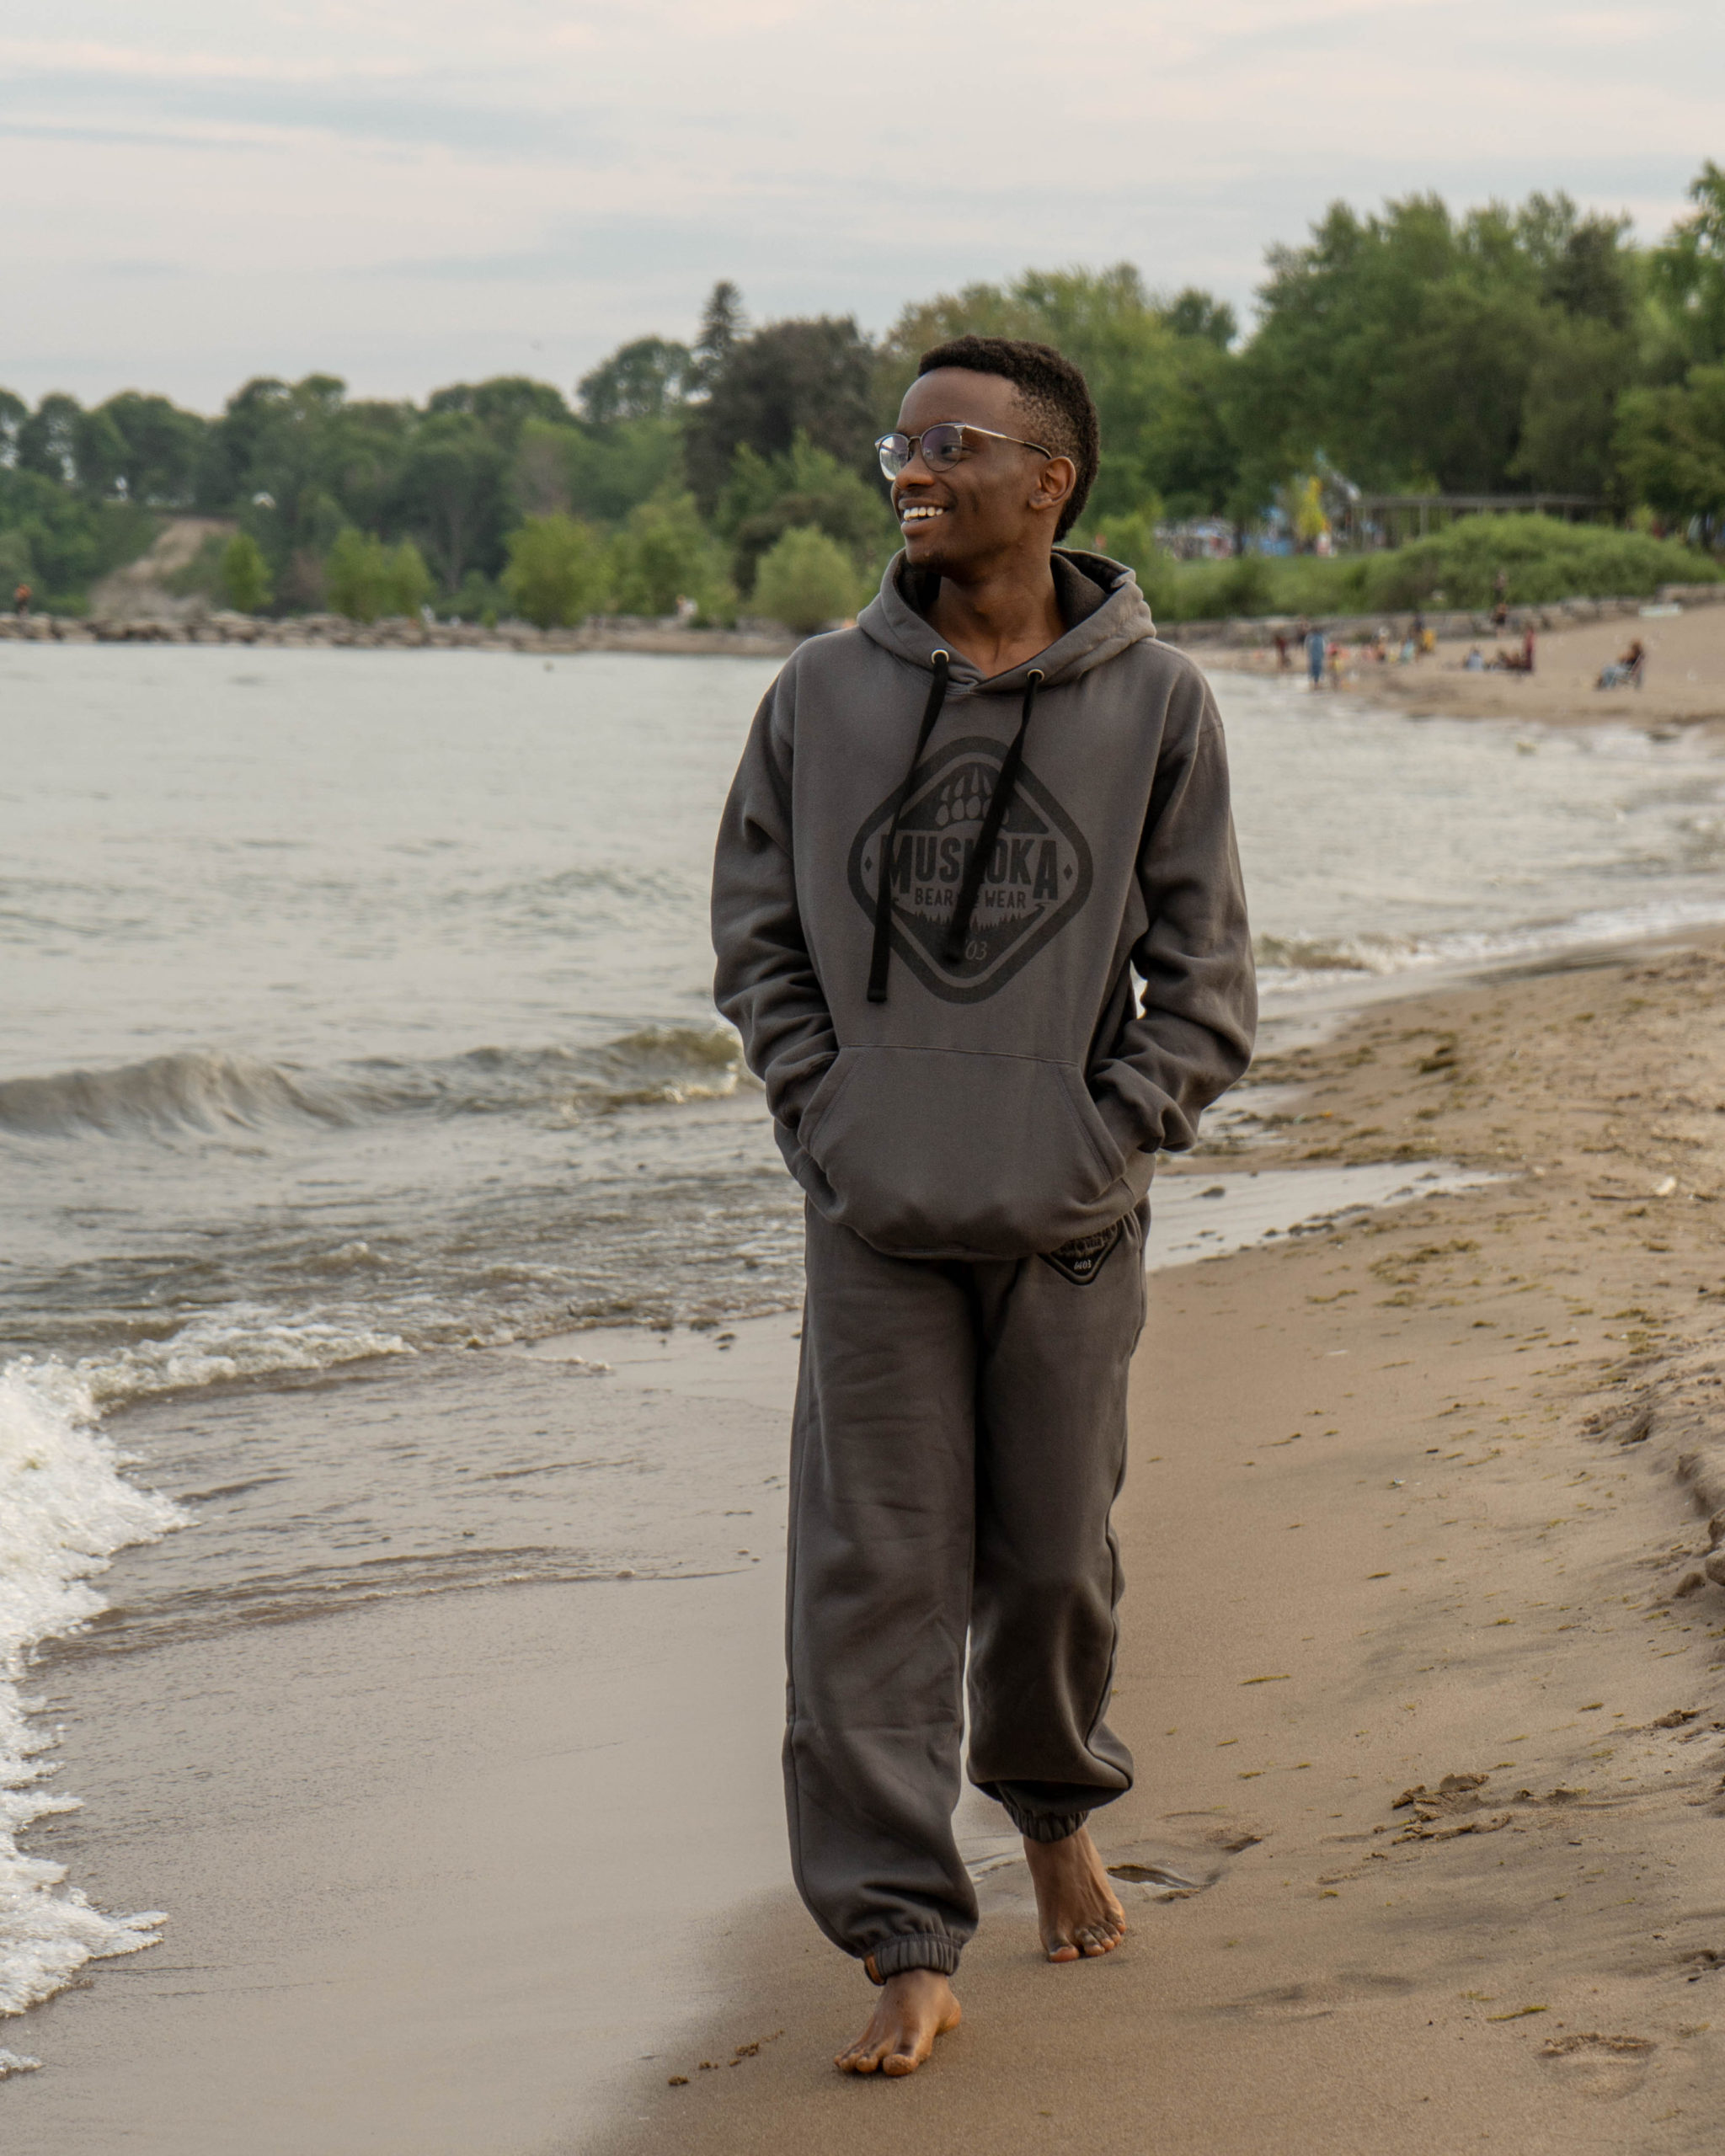 Man walking along beach wearing a matching grey hoody and trackpants